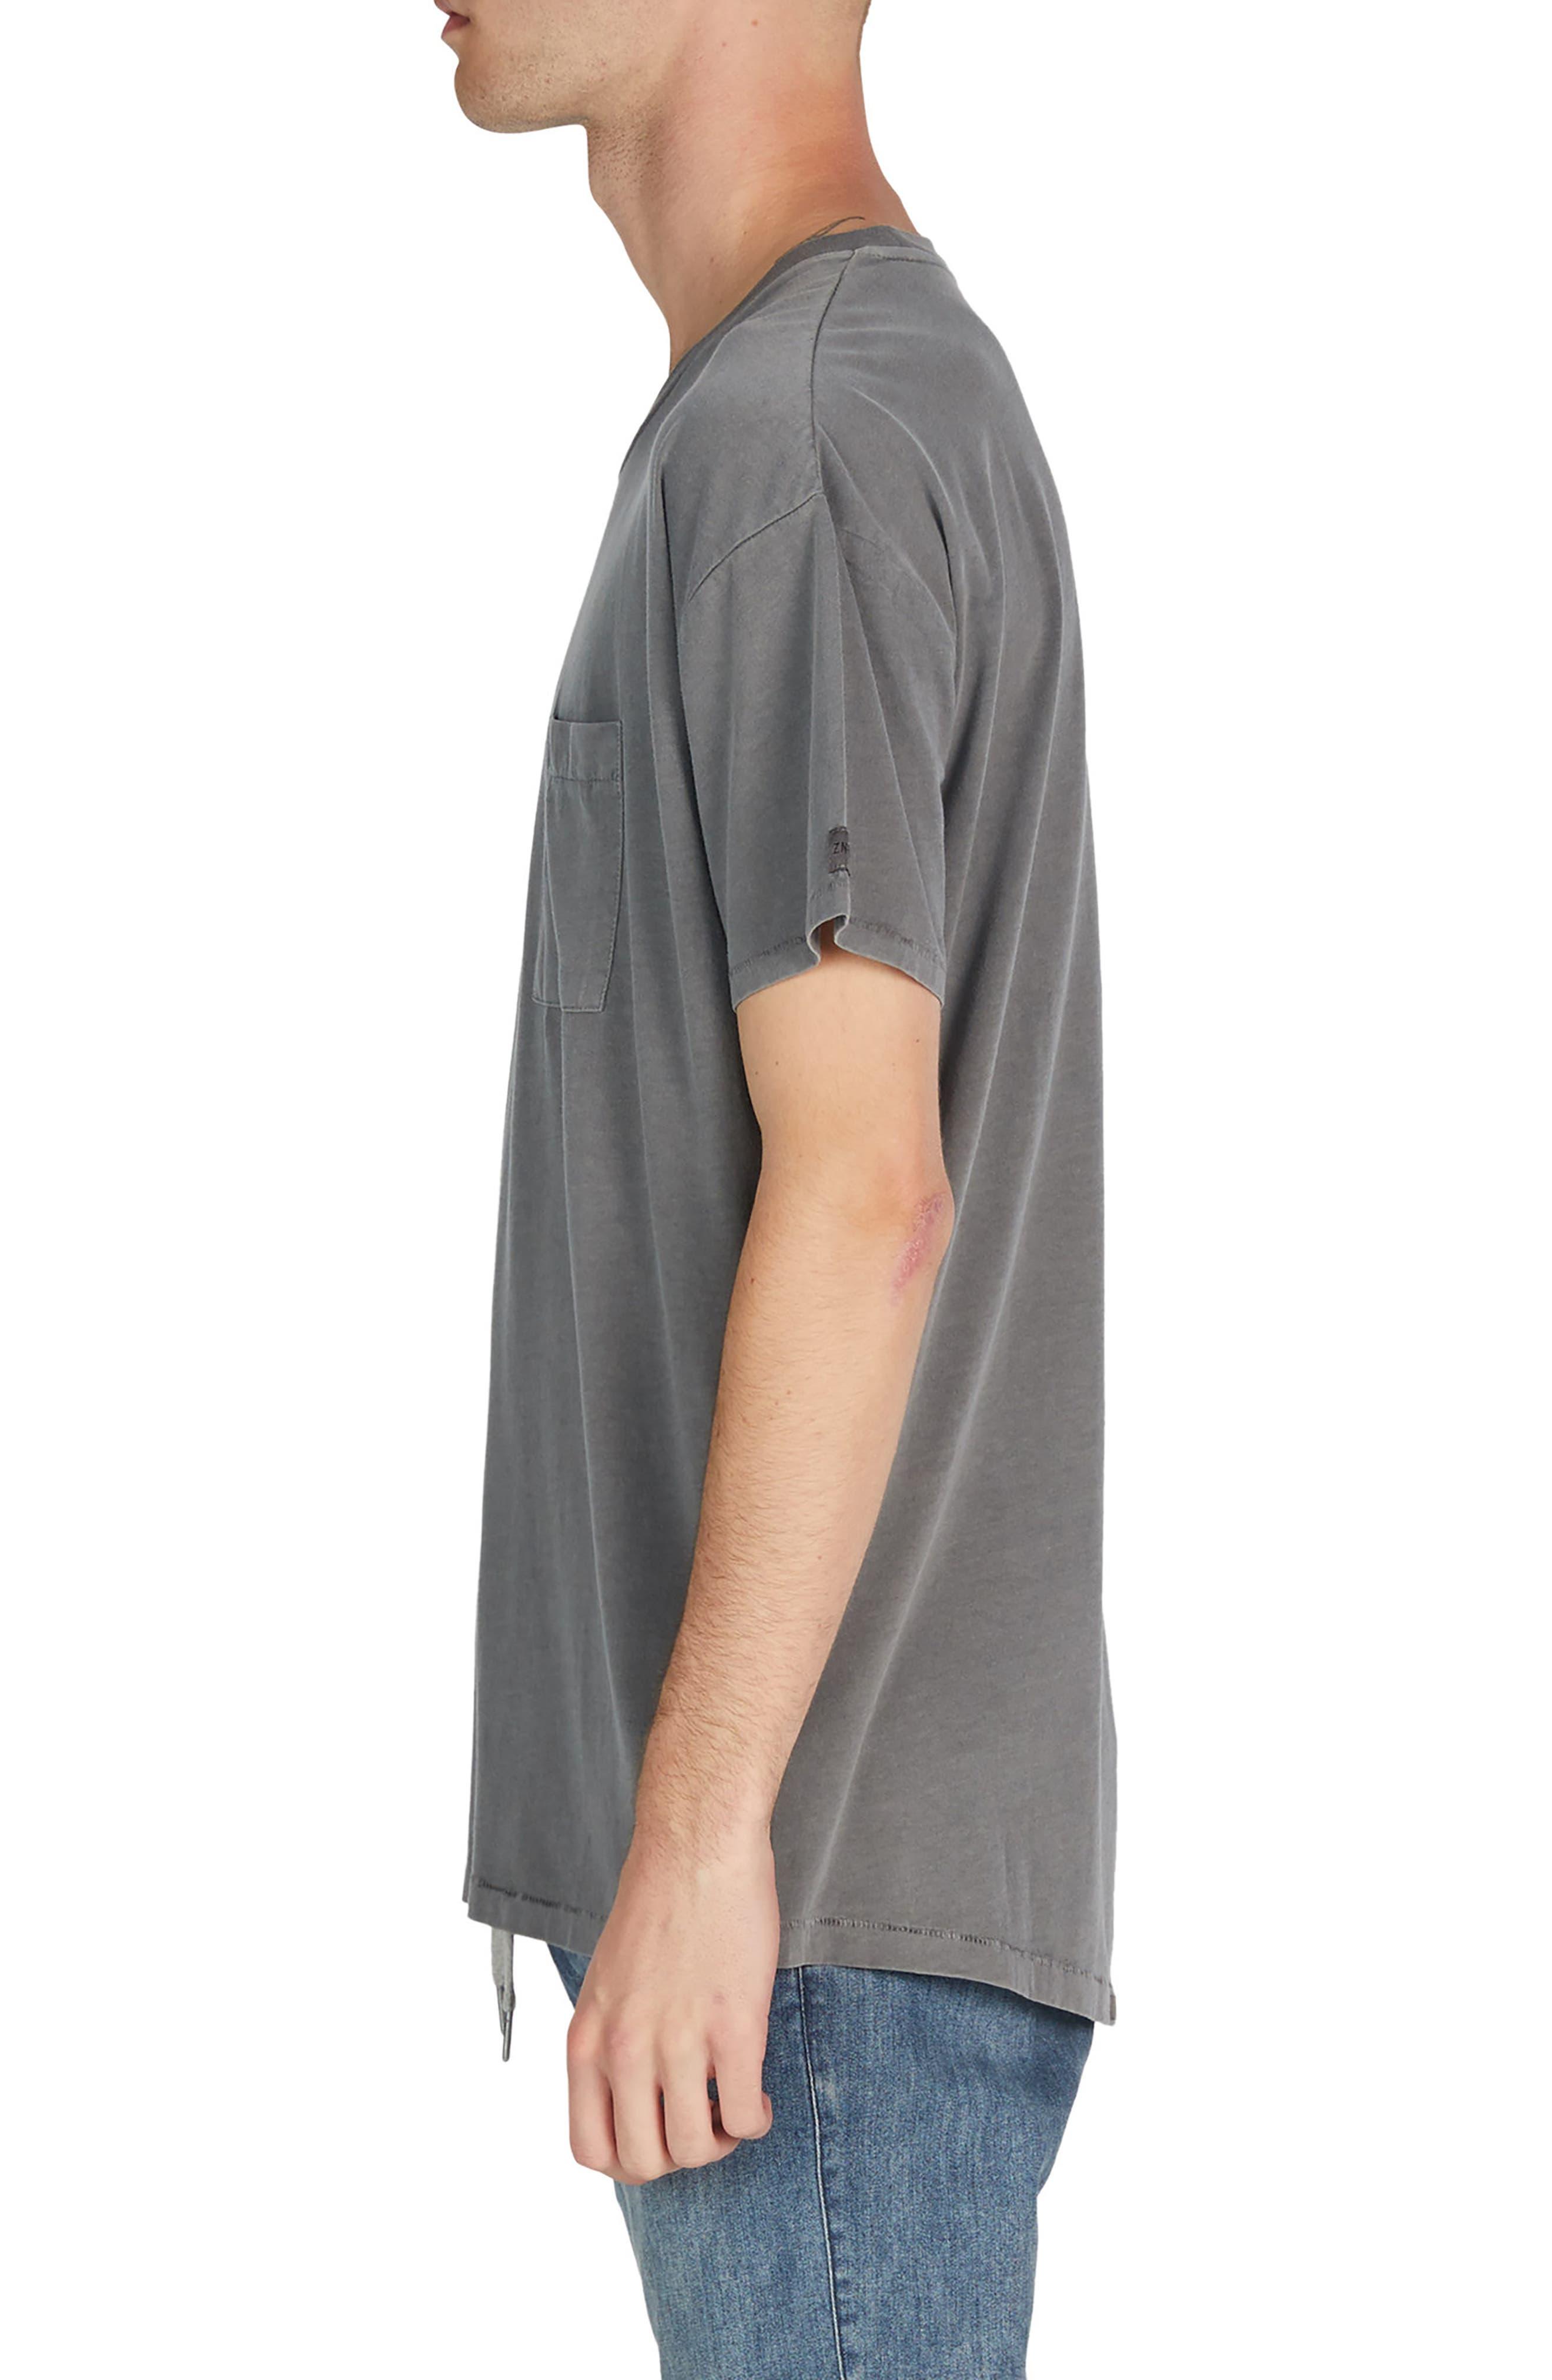 Rugger Pocket T-Shirt,                             Alternate thumbnail 3, color,                             029